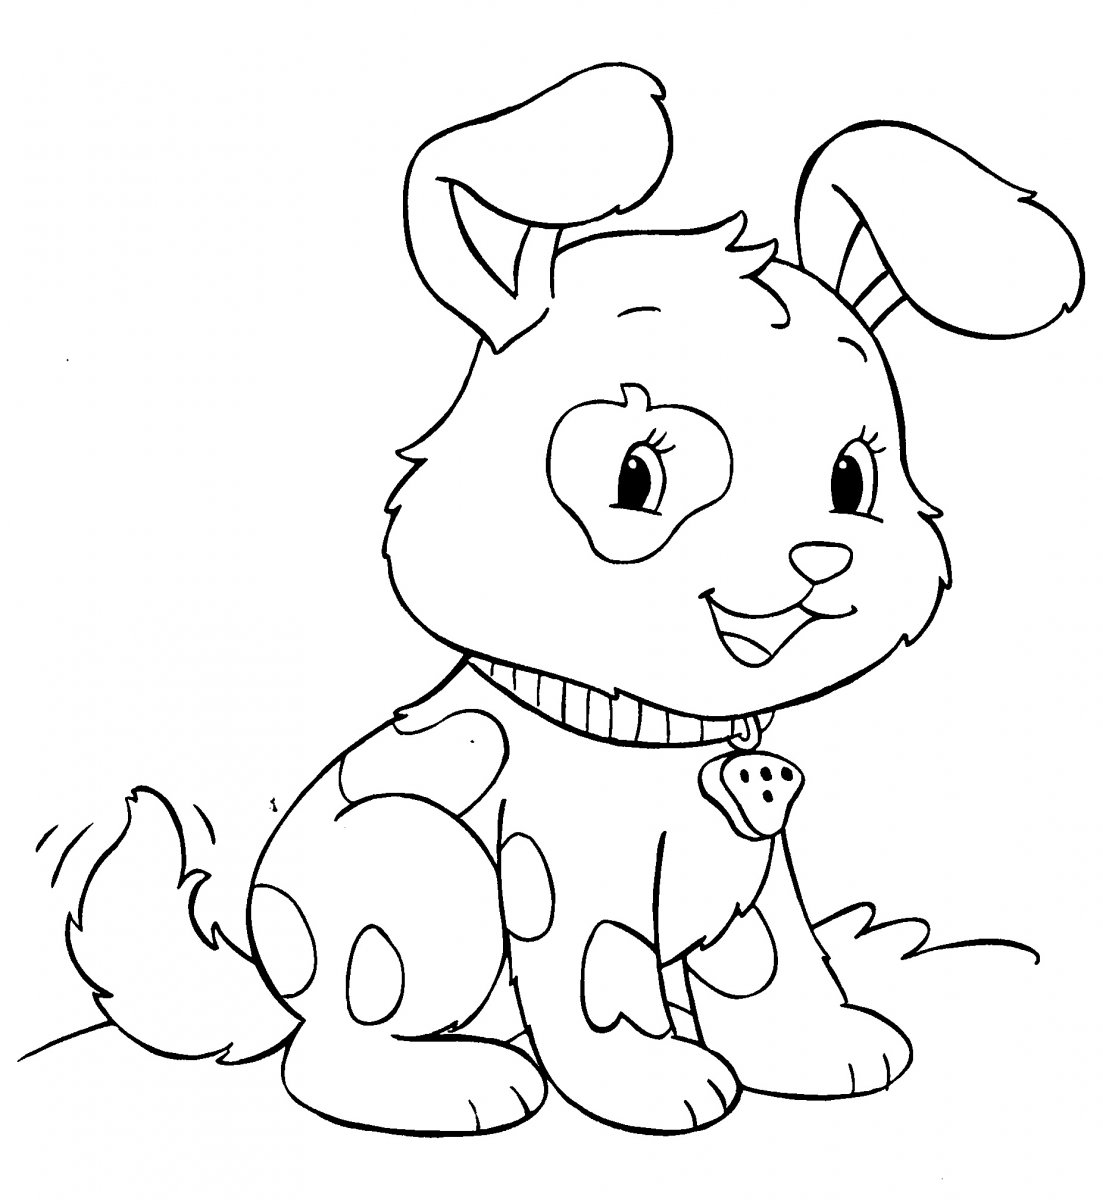 Dibujos de Perritos para colorear  Dibujos para Nios